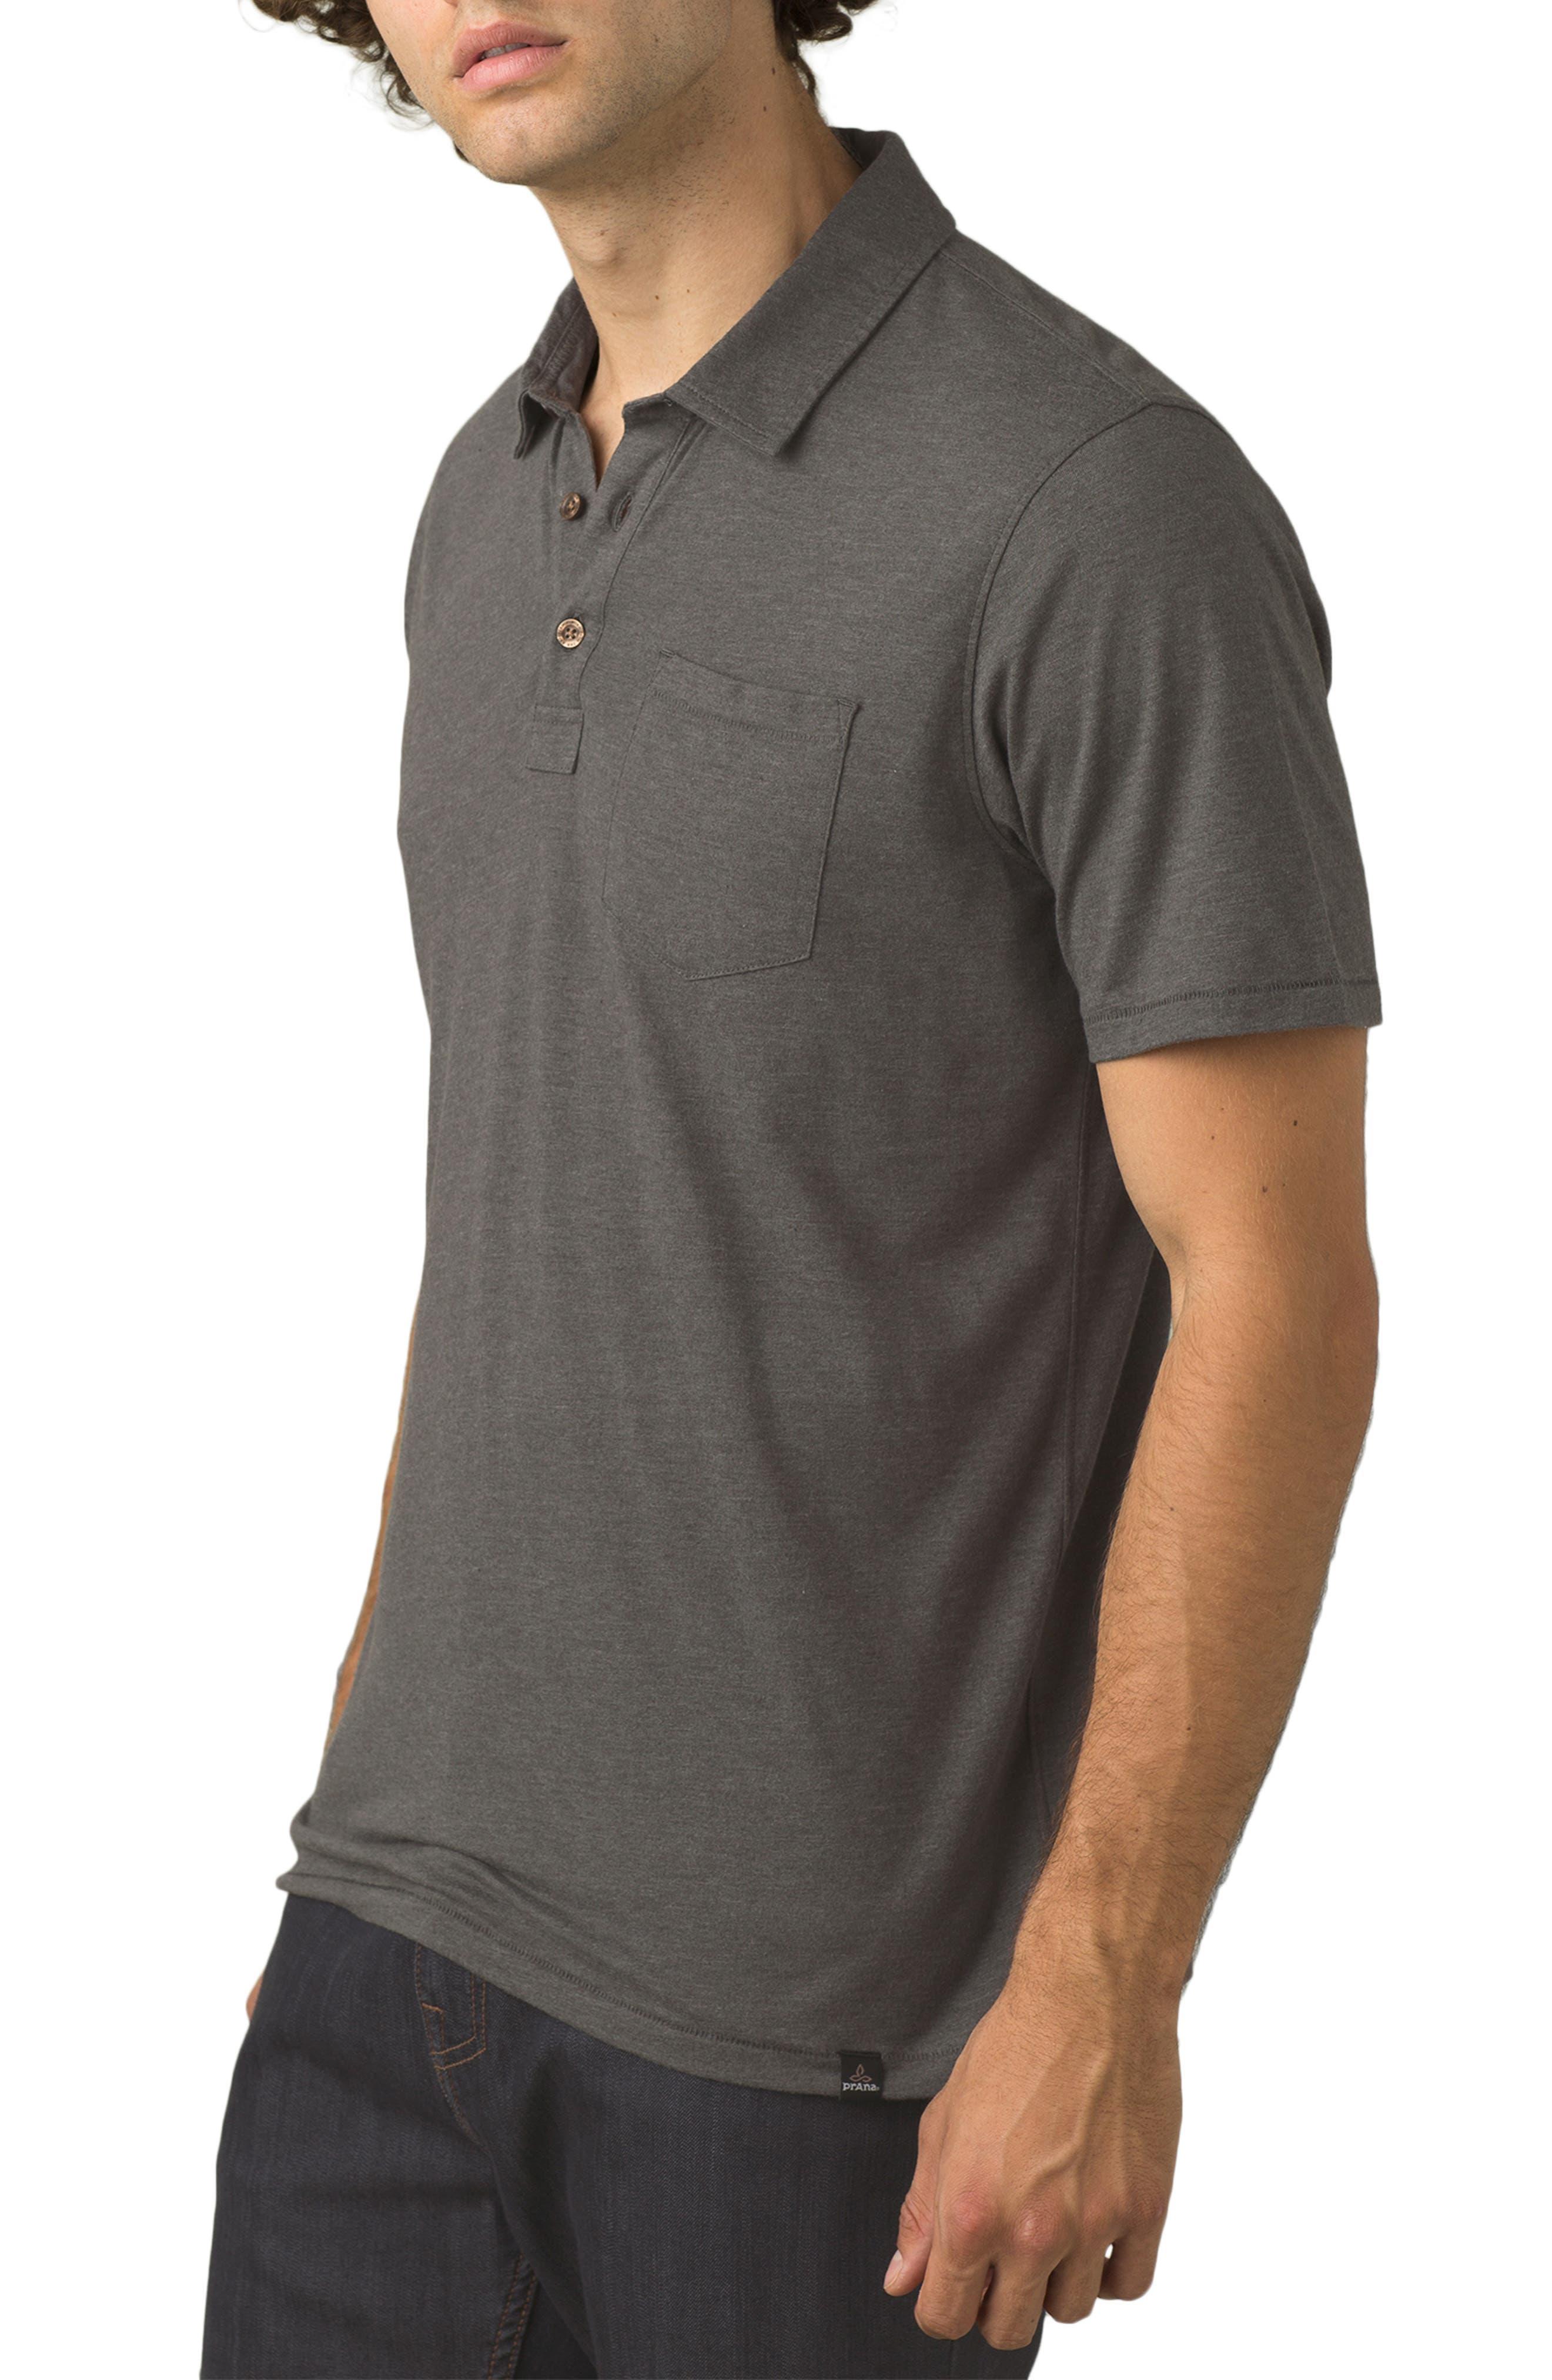 Men's Big & Tall Prana Men's Classic Fit Short Sleeve Polo